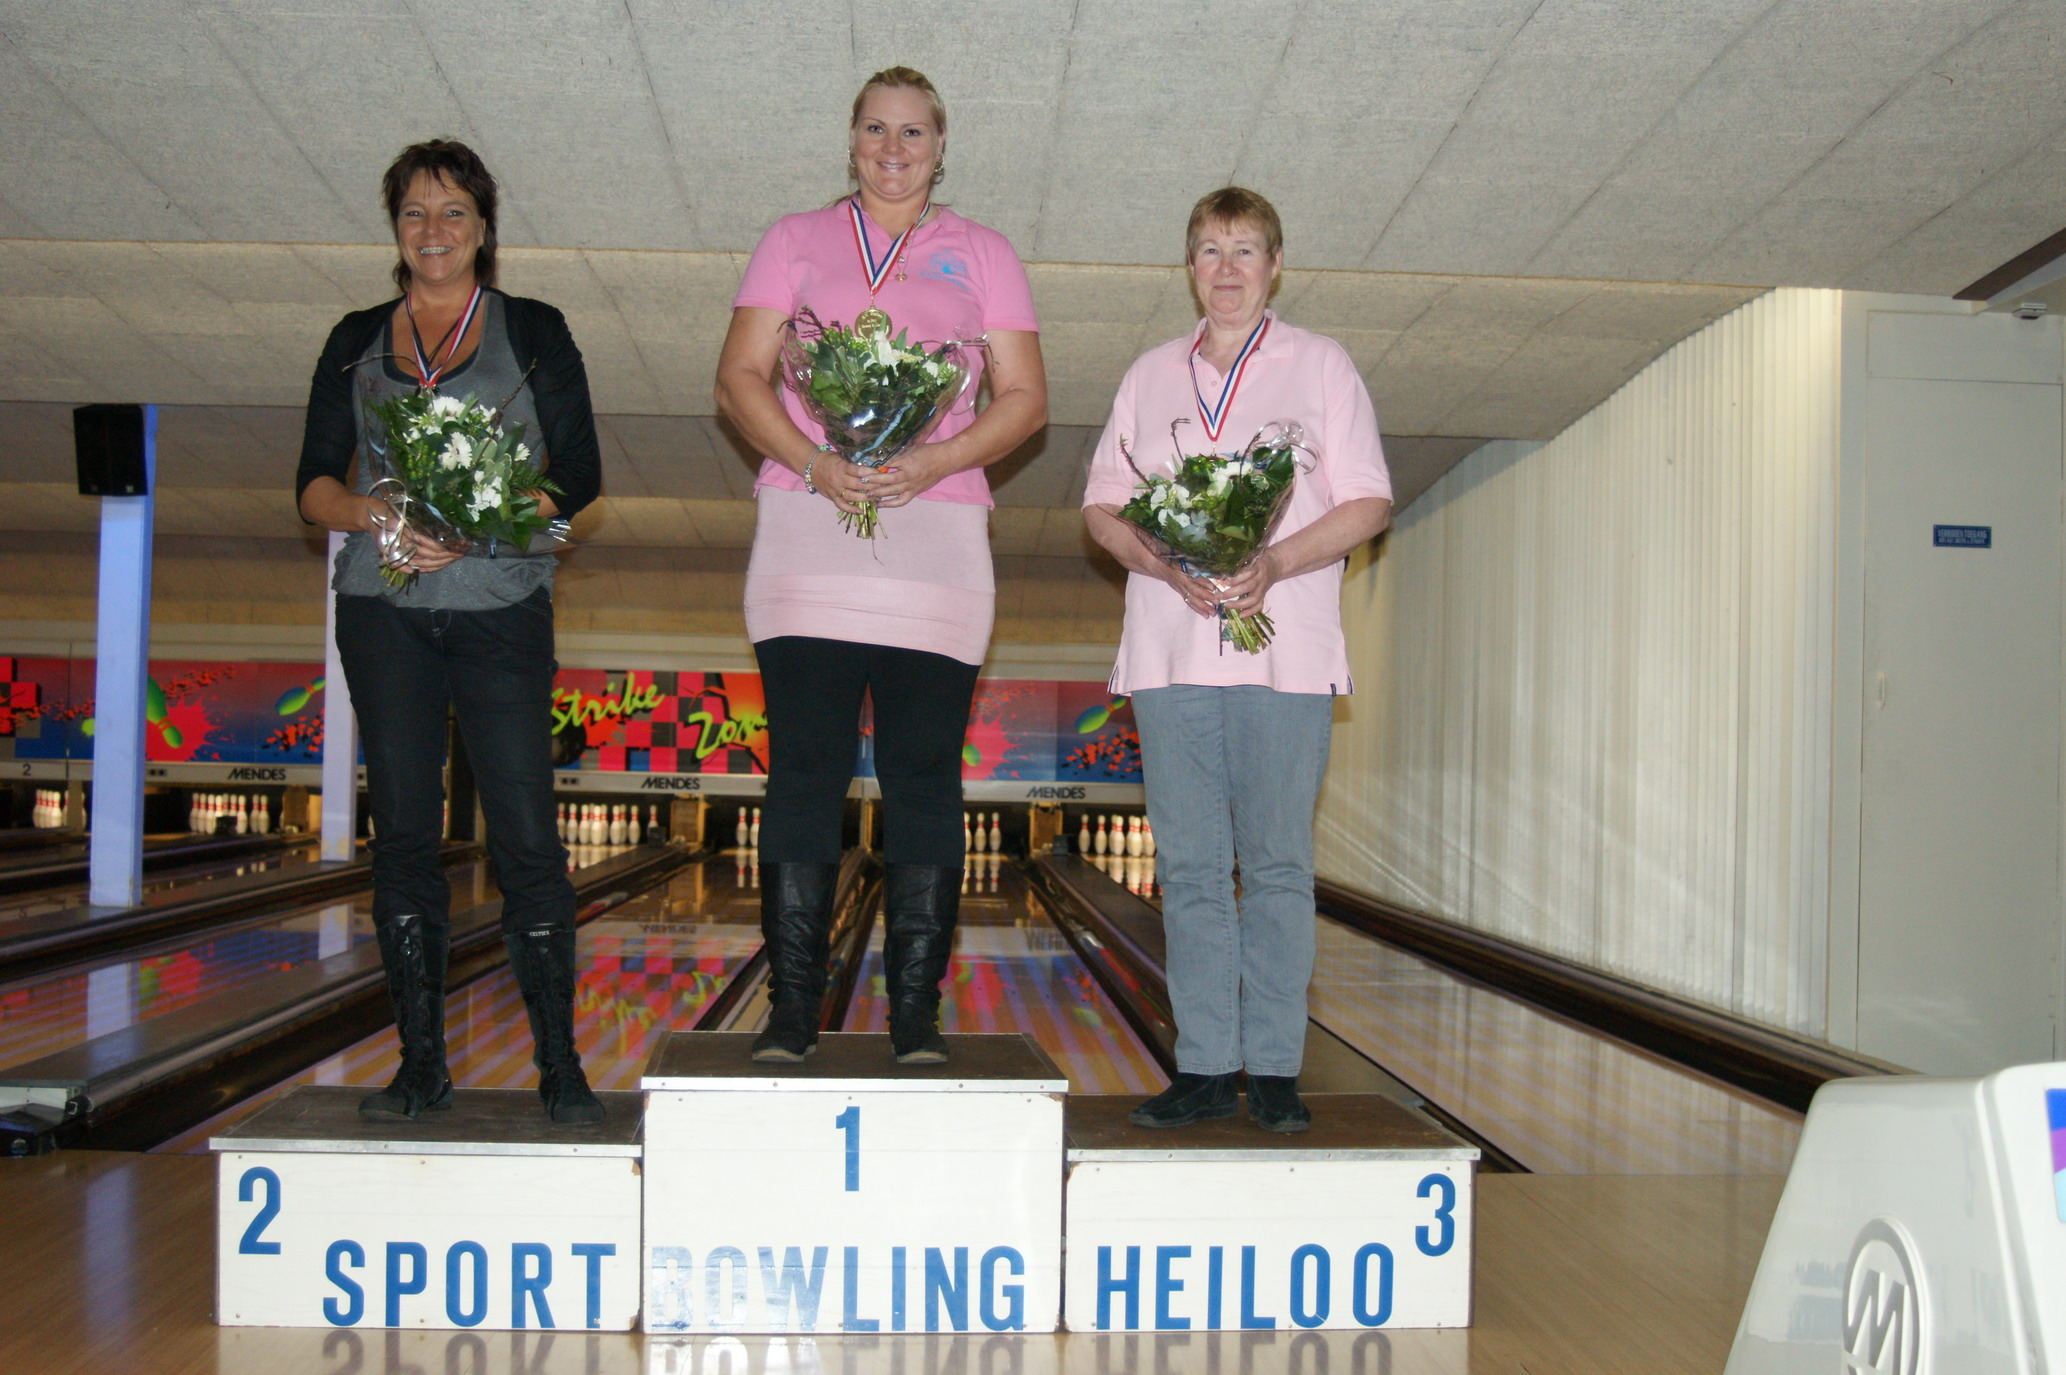 http://www.bowlingverenigingheiloo.nl/fotos_verhalen/foto's/2010_0204-Ver.kamp-Dames-CD.jpg